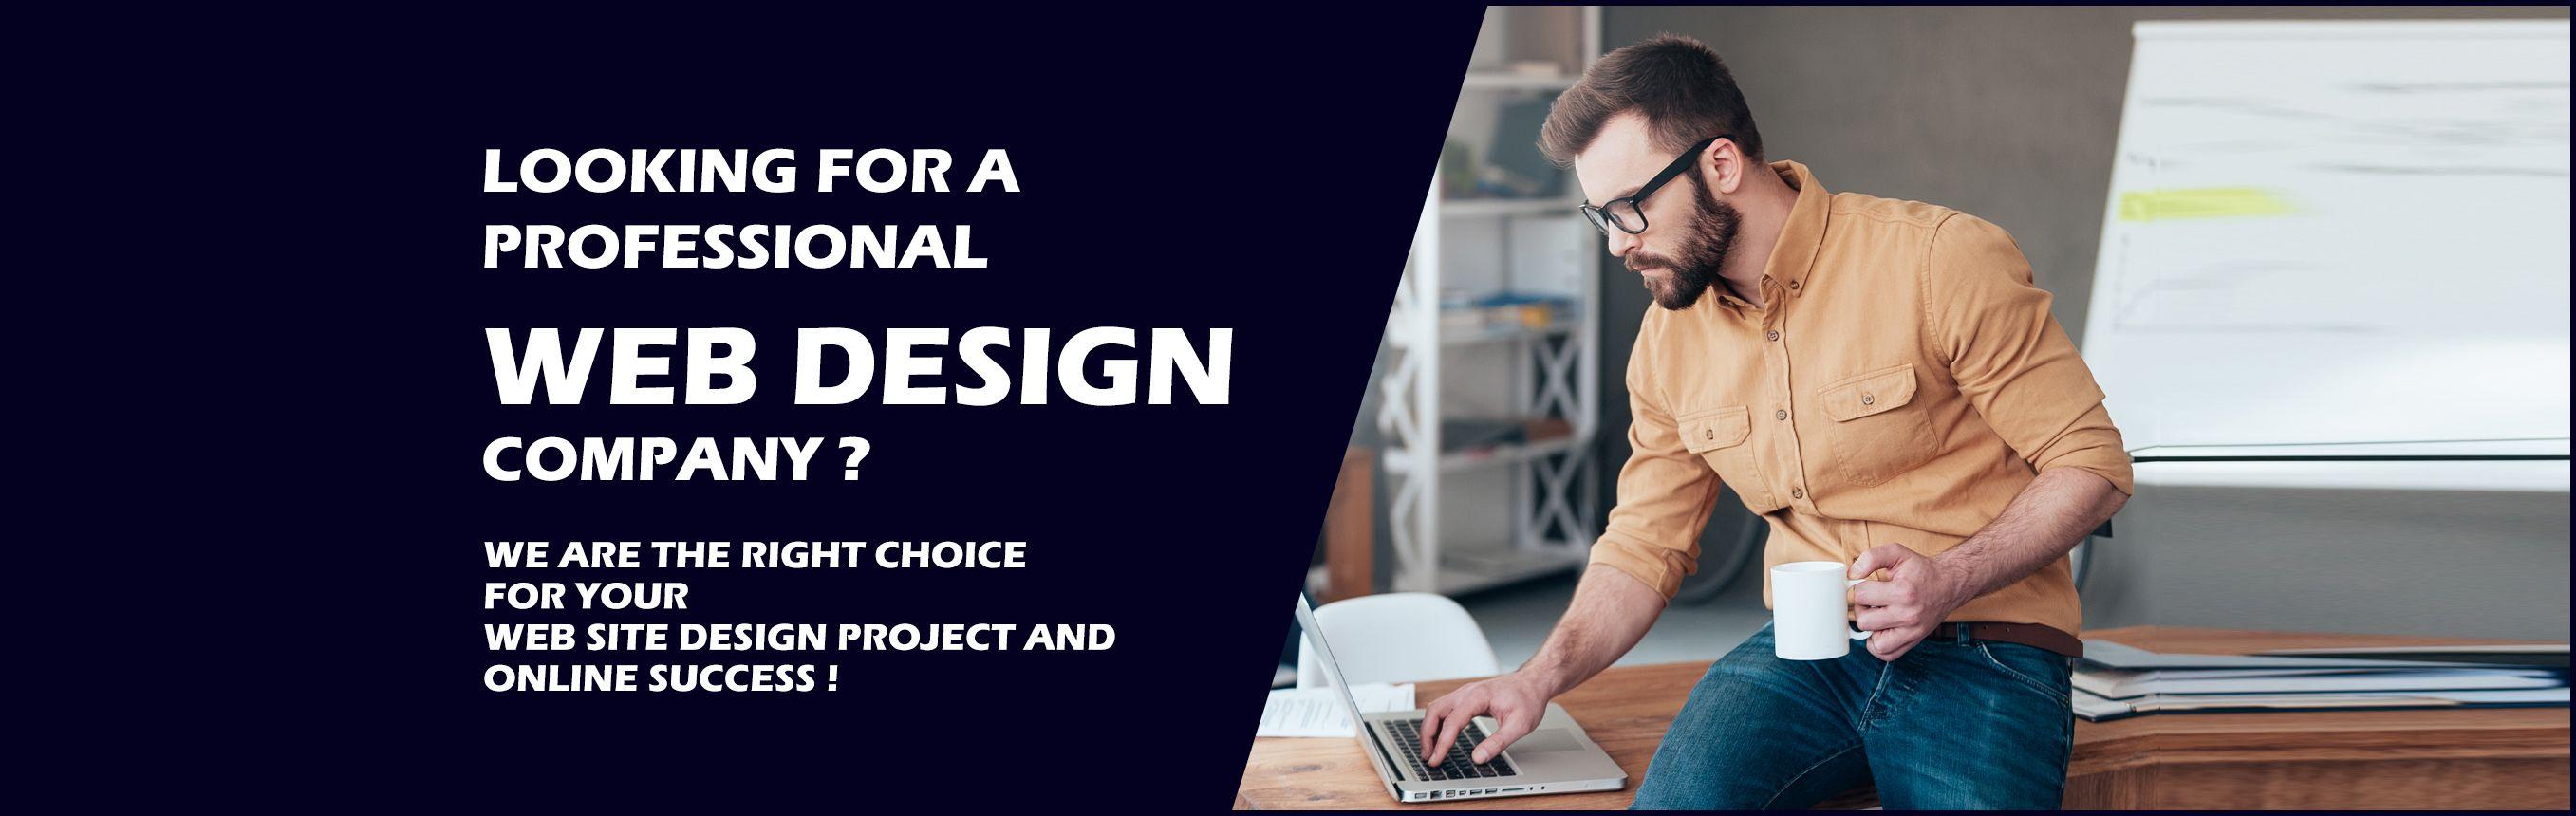 A Href Https Www Beespoint Com Web Design In Sri Lanka A We Are High Quality Web Design Service In Sri Lanka Specialized In Providing Web Des Web Design